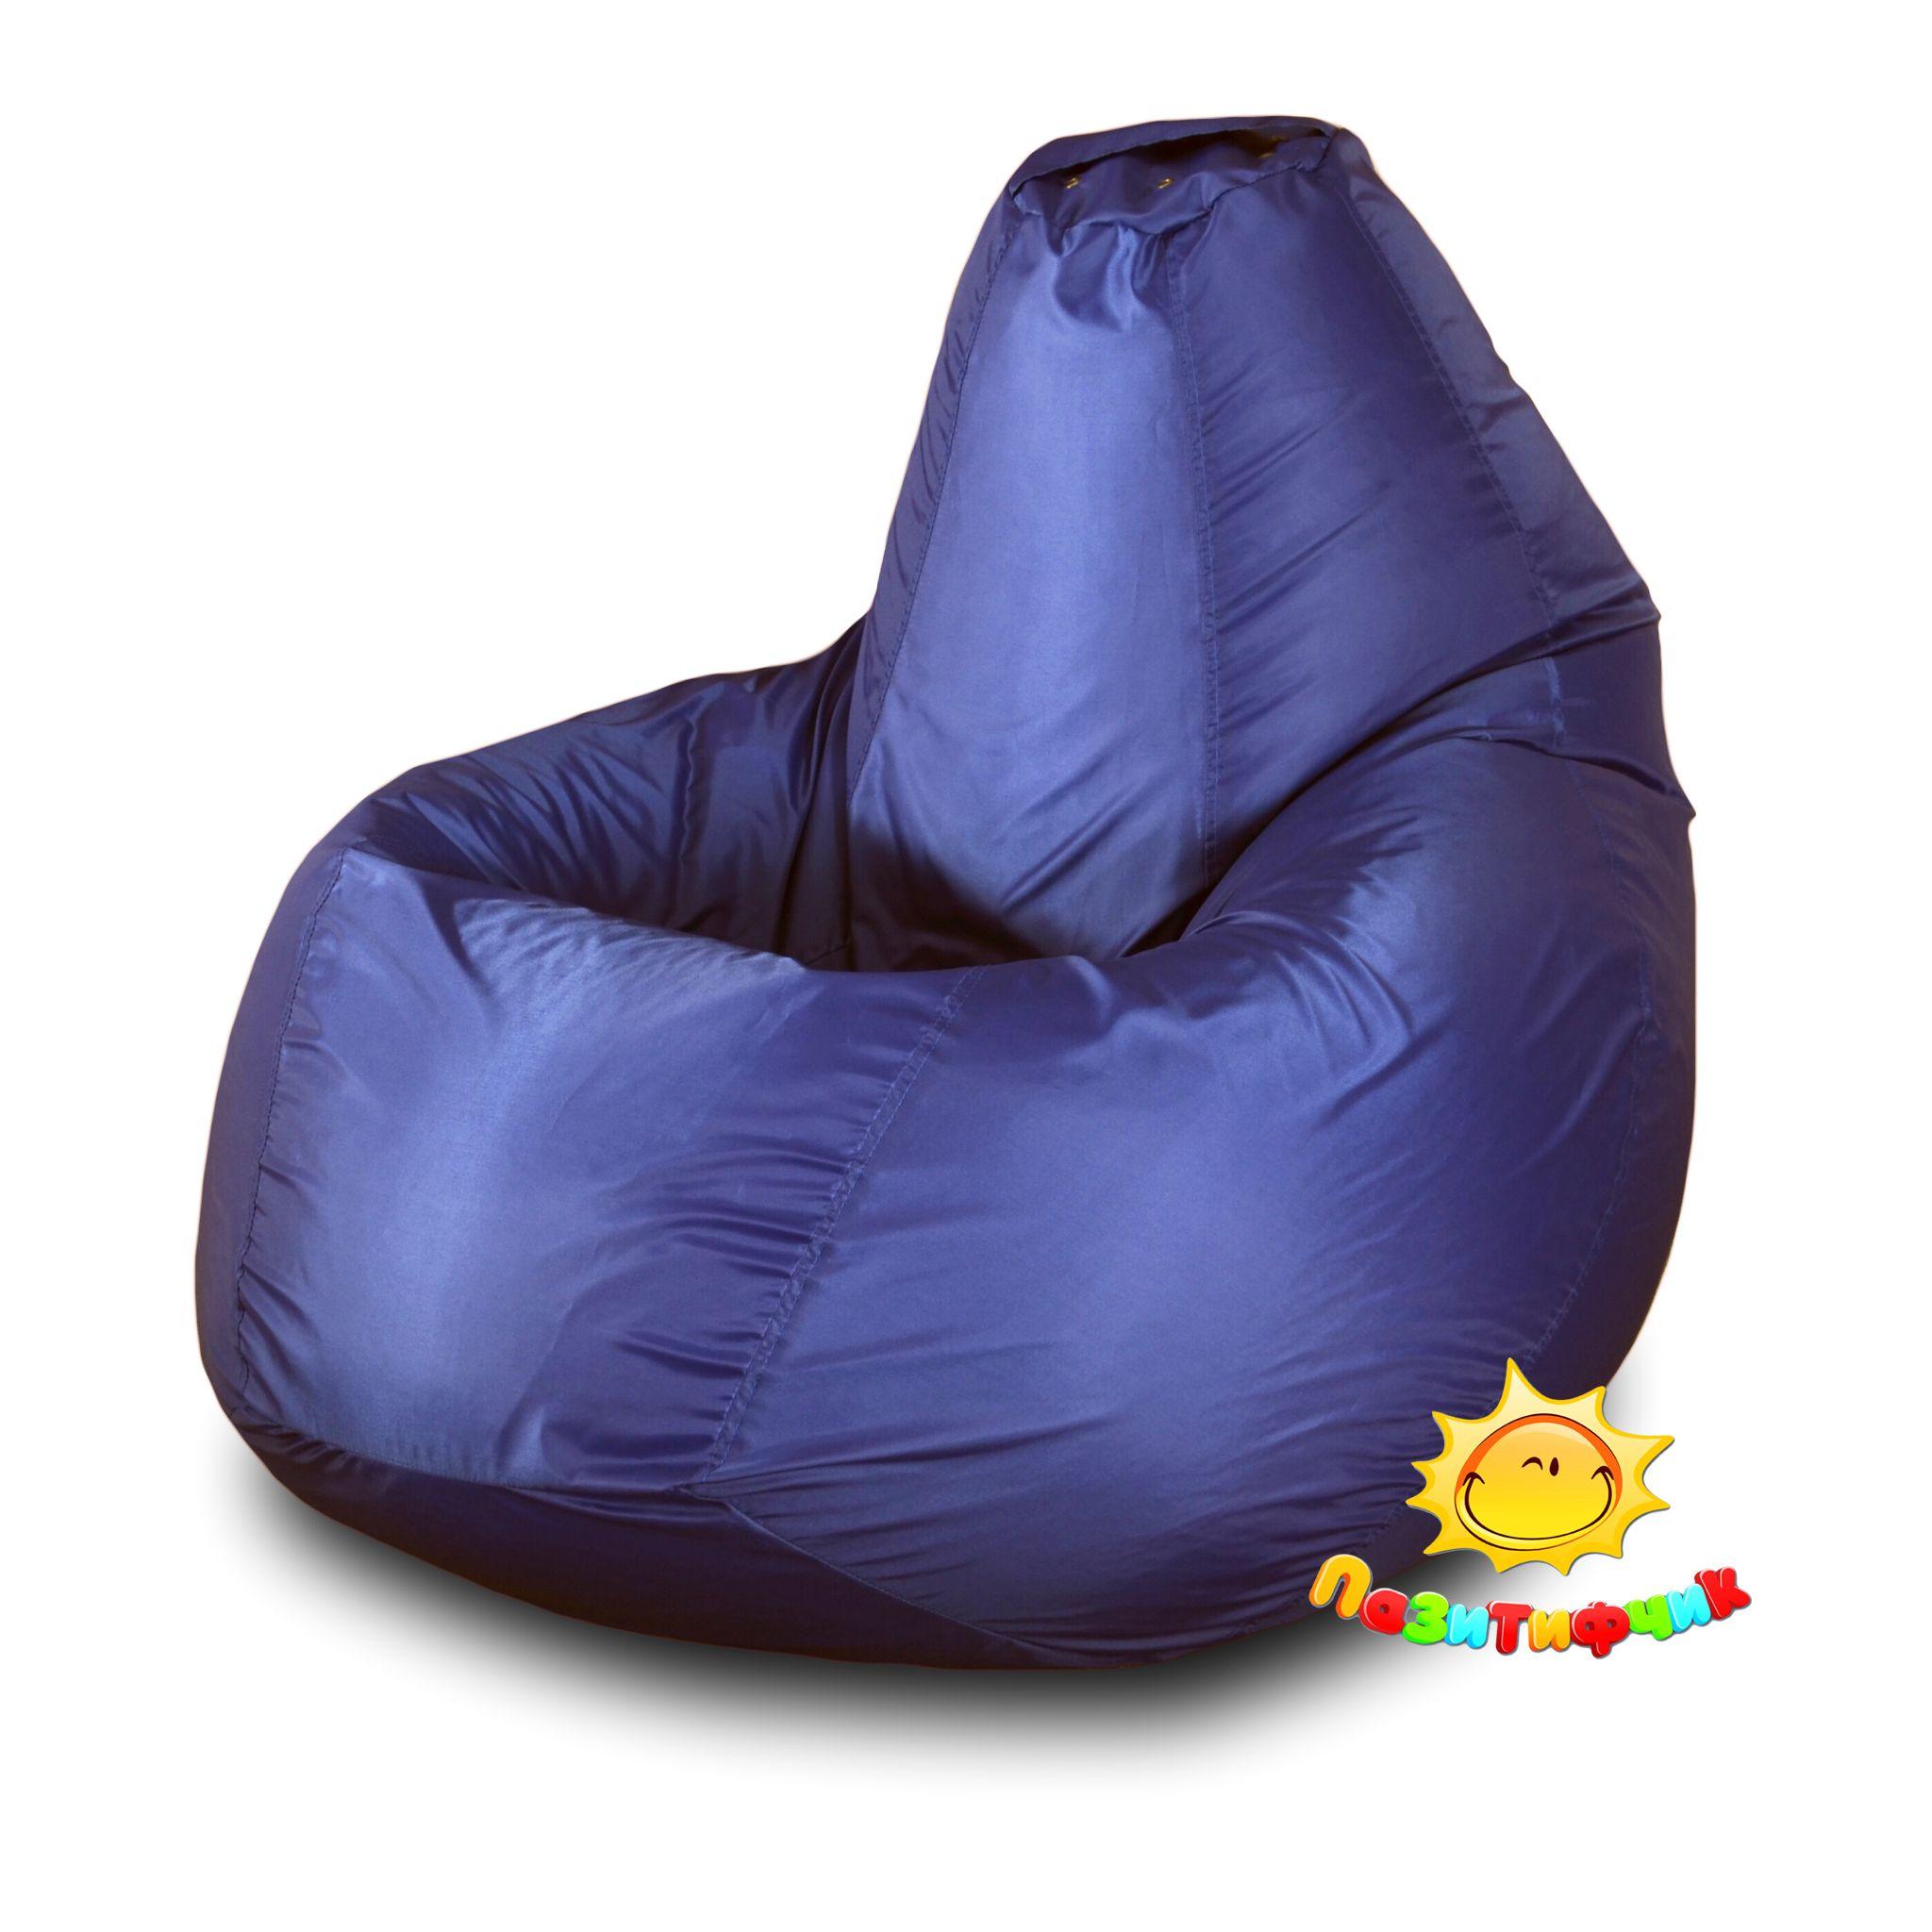 Кресло-мешок Pazitif Груша Пазитифчик Оксфорд, размер XXXL, оксфорд, синий